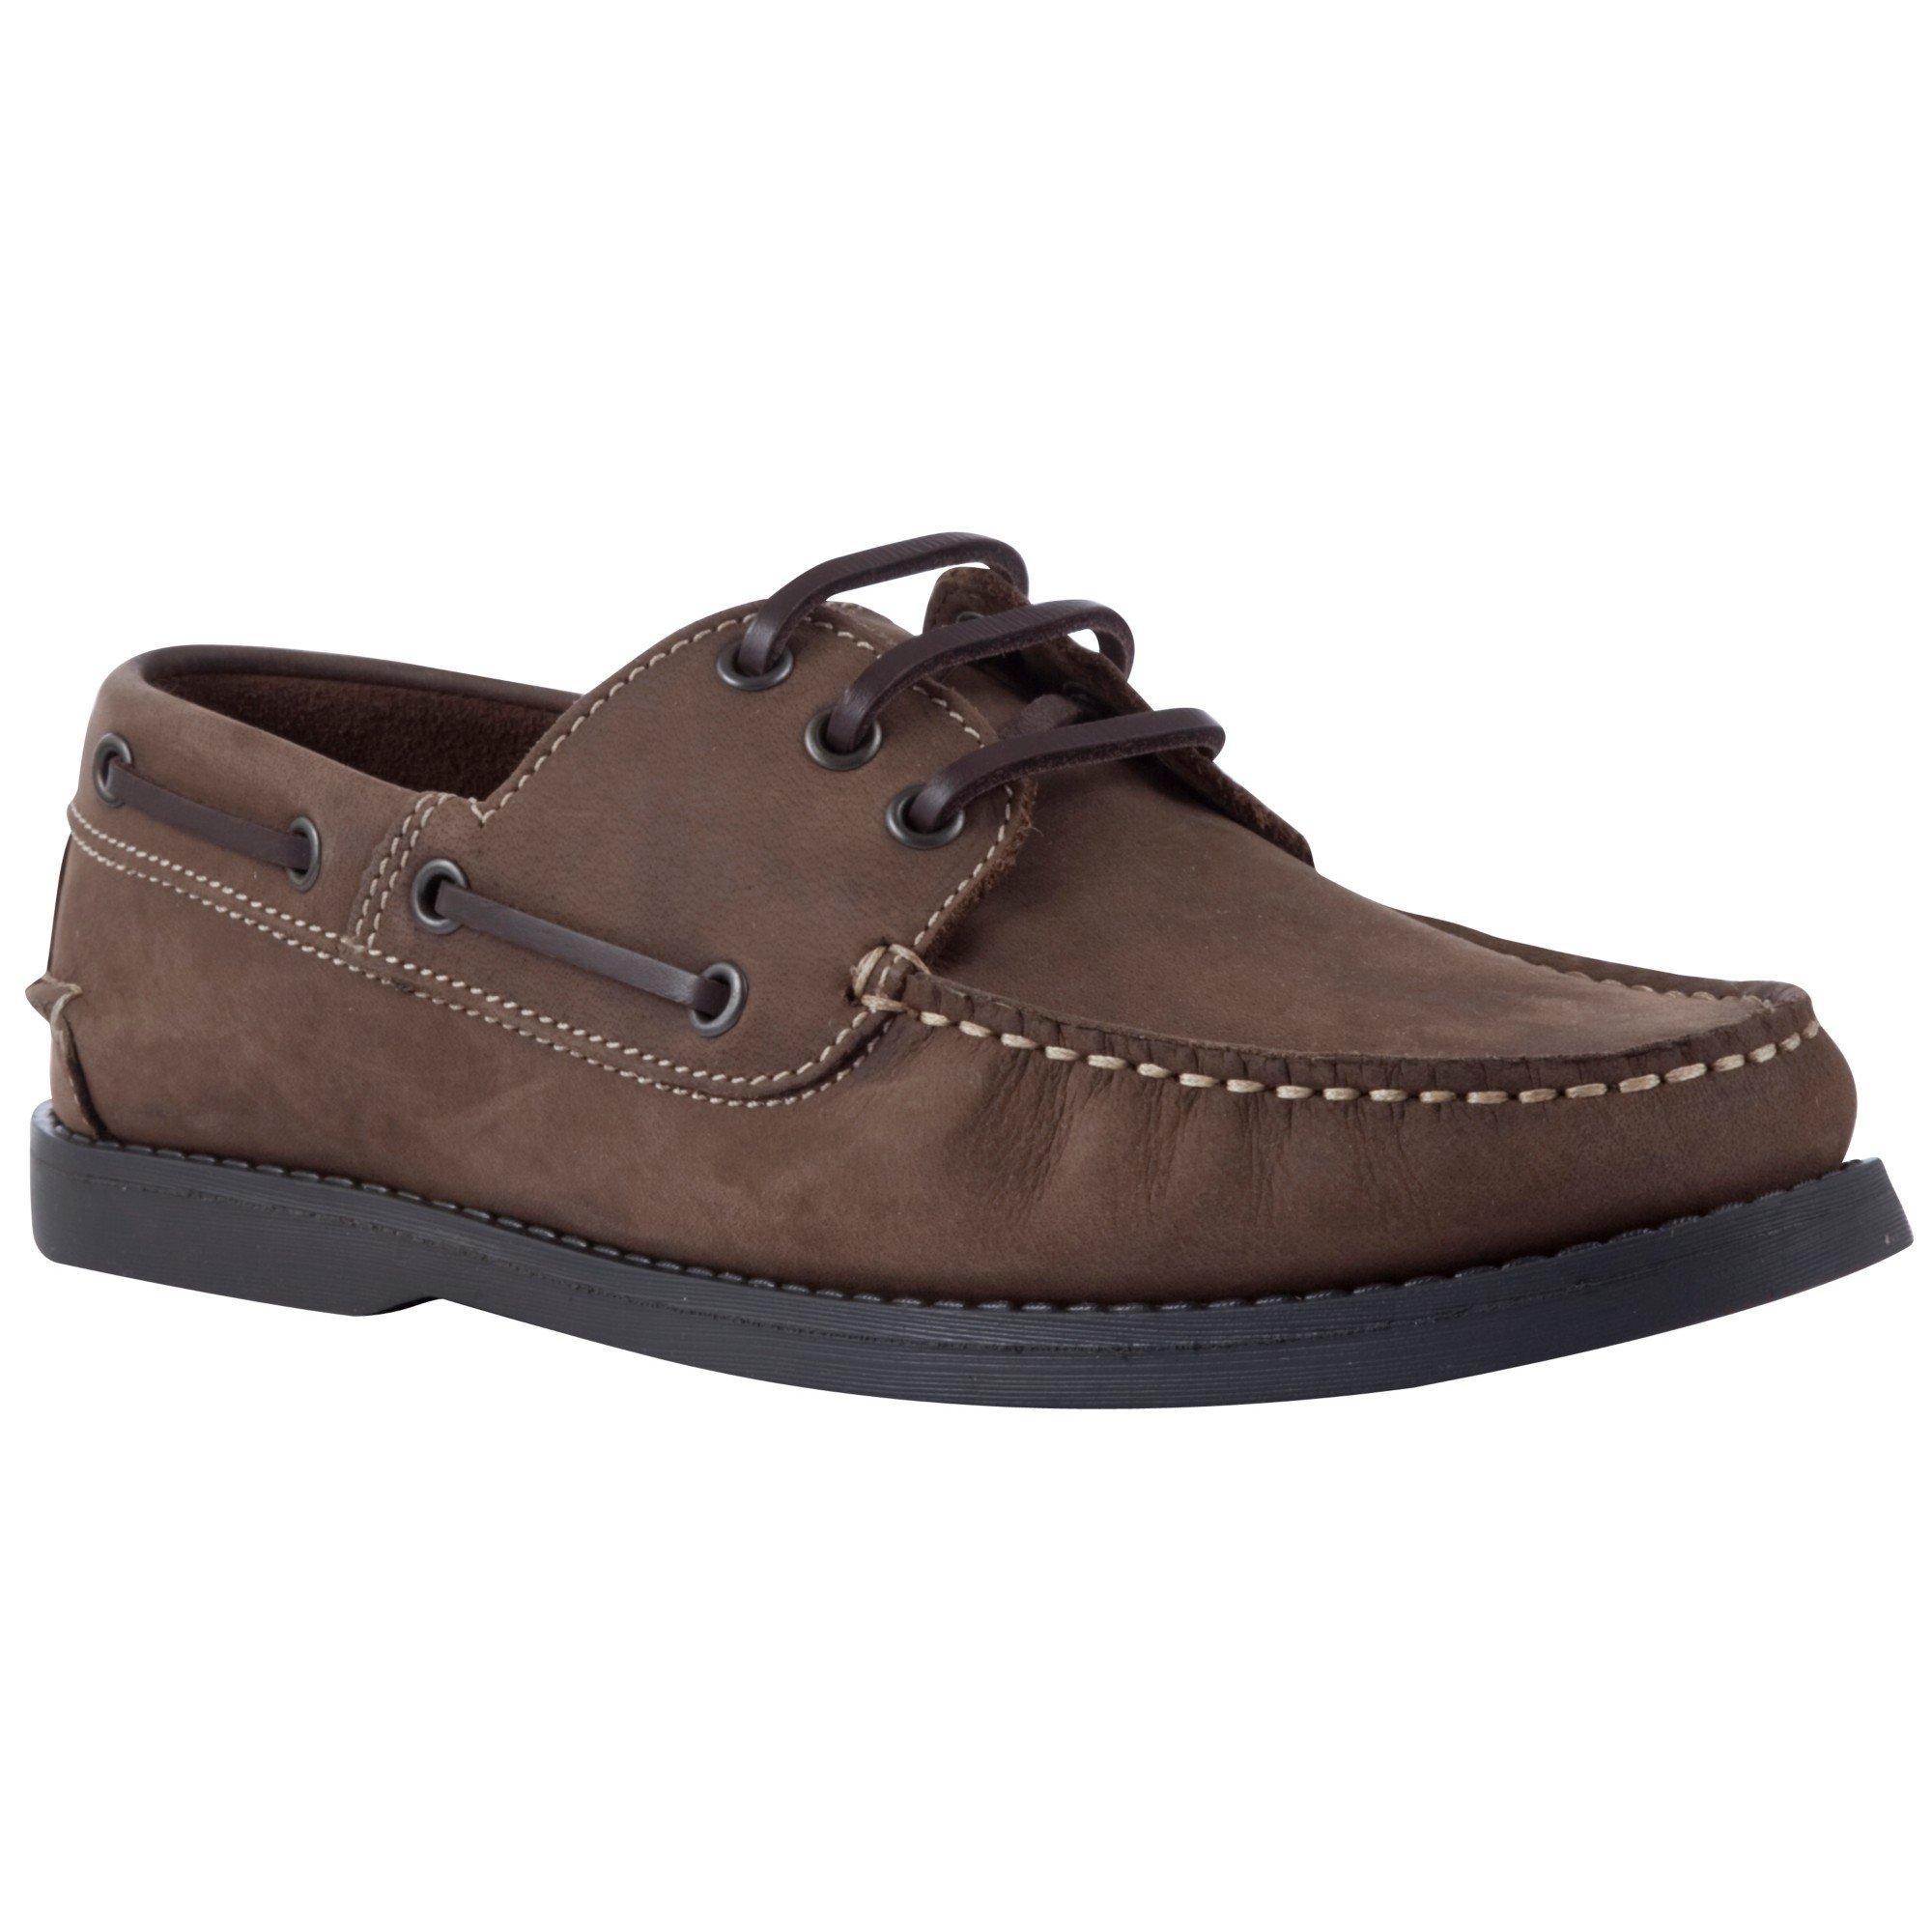 Vans Boat Shoes Leather